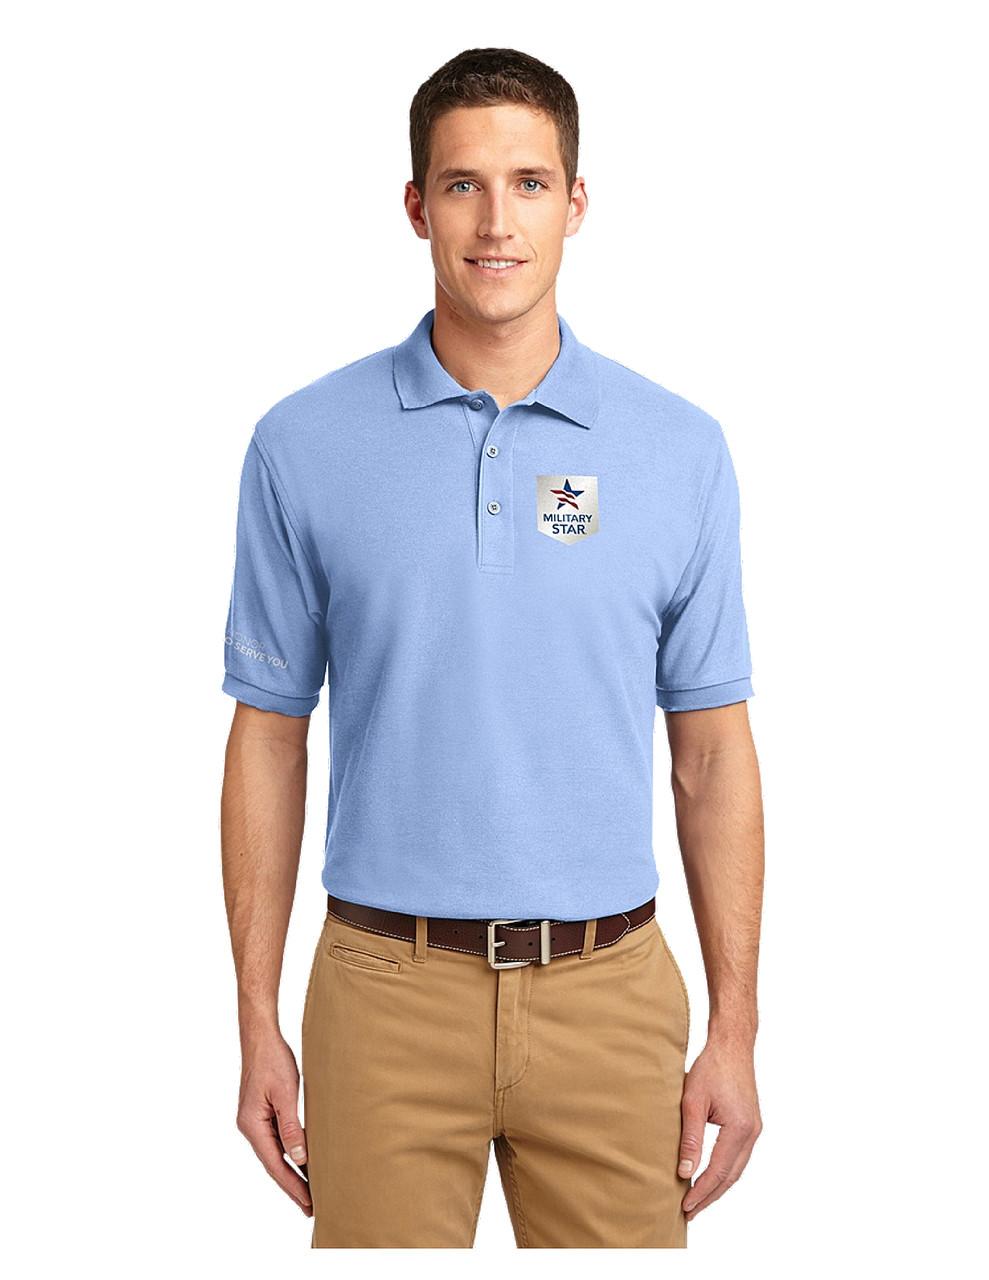 1f10ddd89 Military Star Men's Polo Shirt - Light Blue - AAFES Associate Apparel